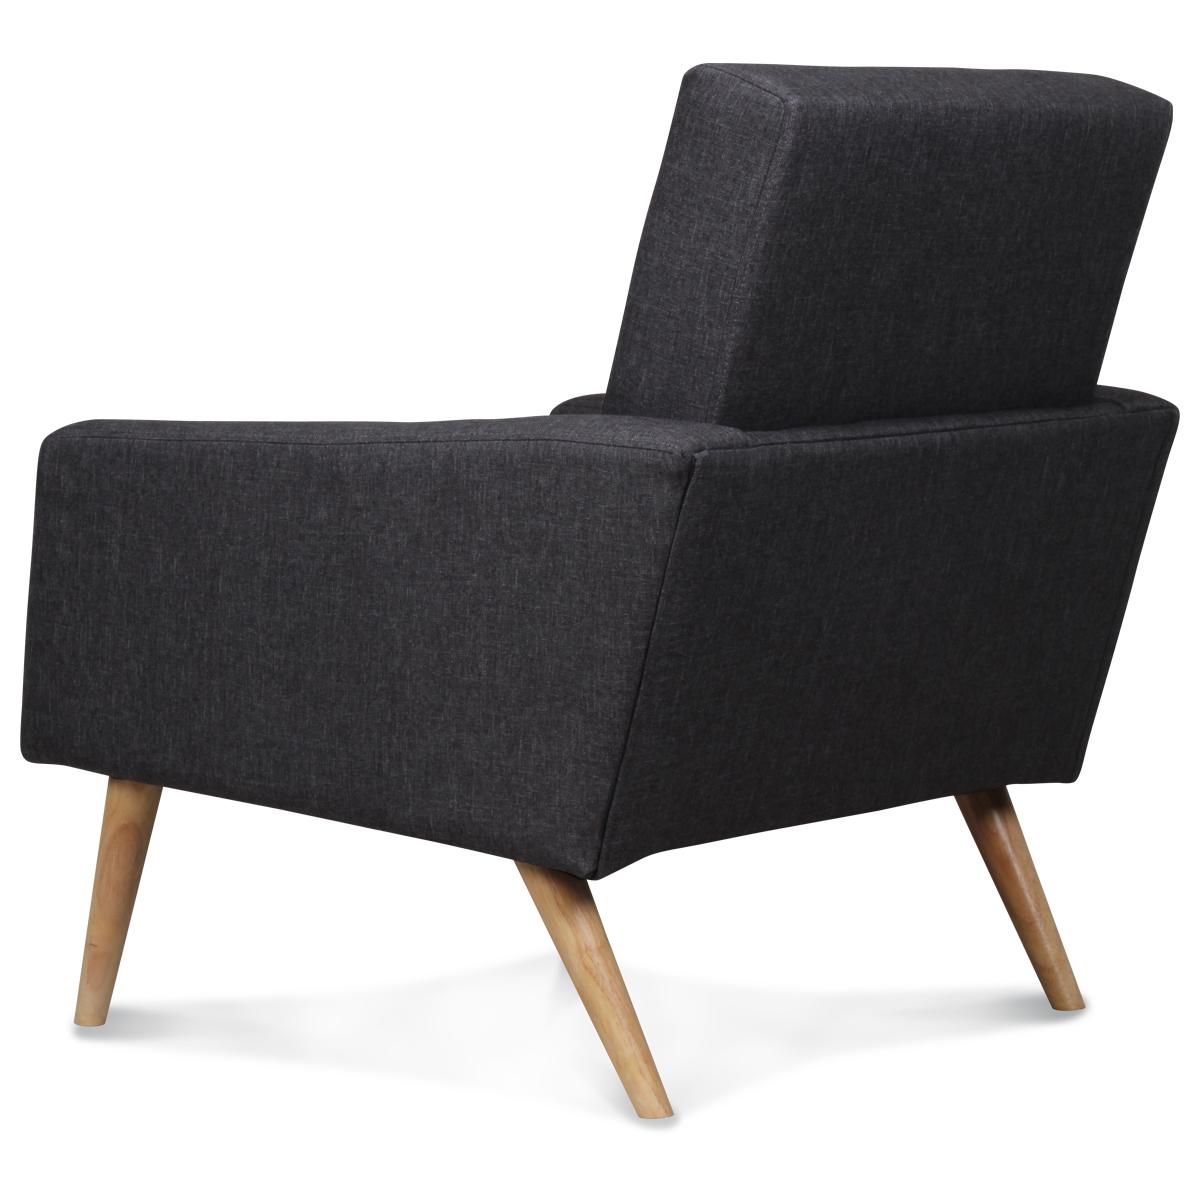 Fauteuil design scandinave moderne gris anthracite fitz demeure et jardin - Fauteuil moderne design ...